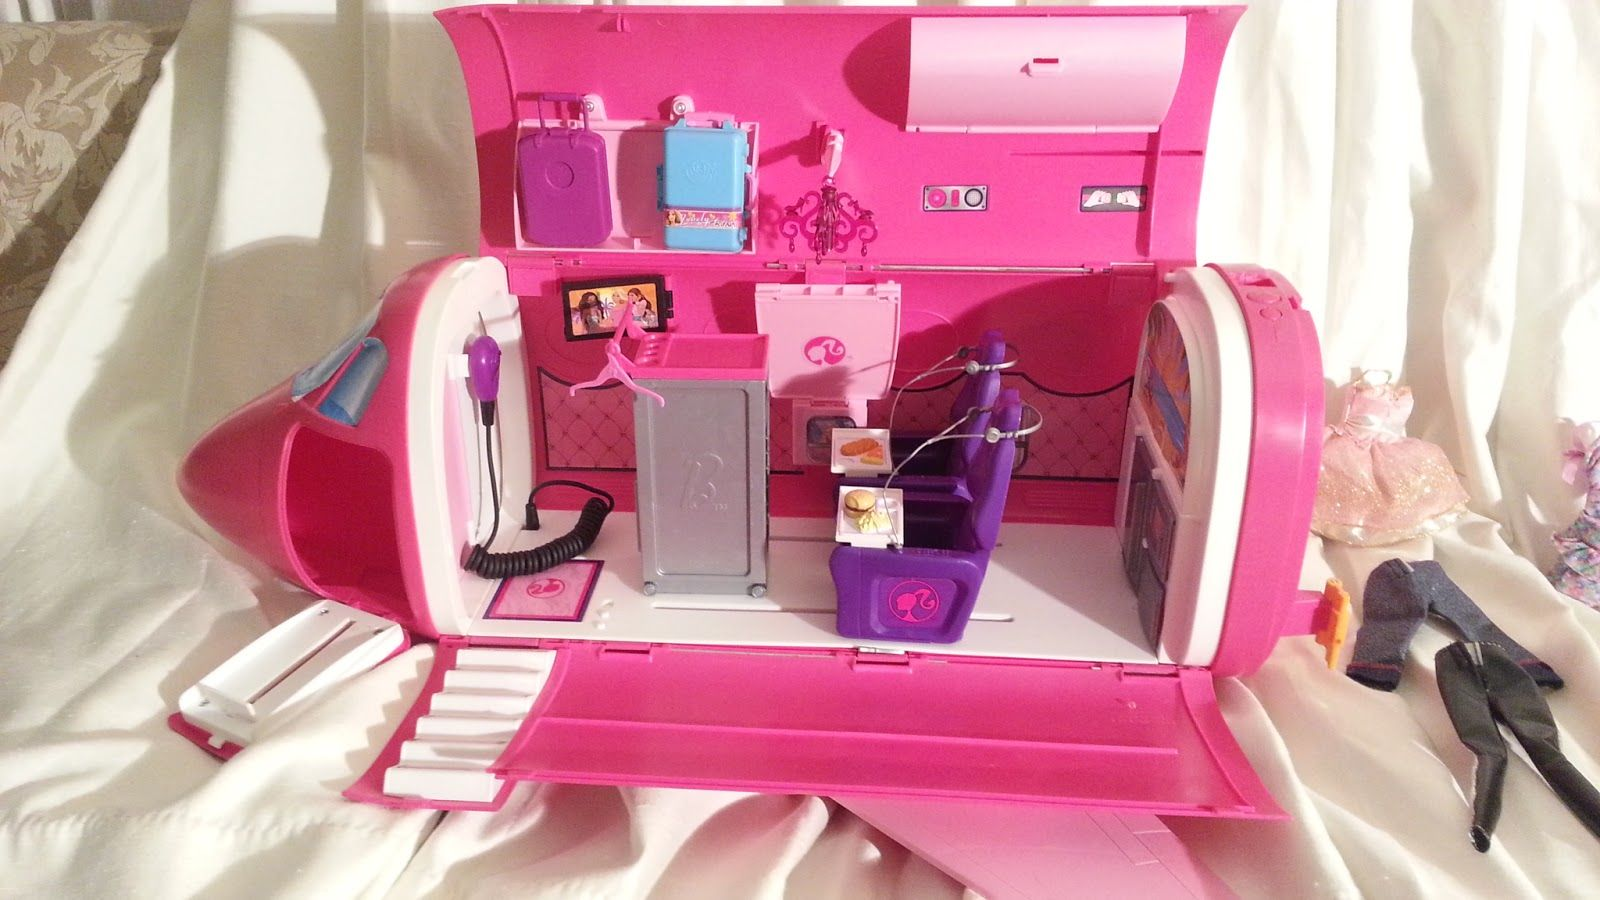 Barbie Glam Vacation Jet Airplane Okc 30 Barbie Toys Garage Sale Tips